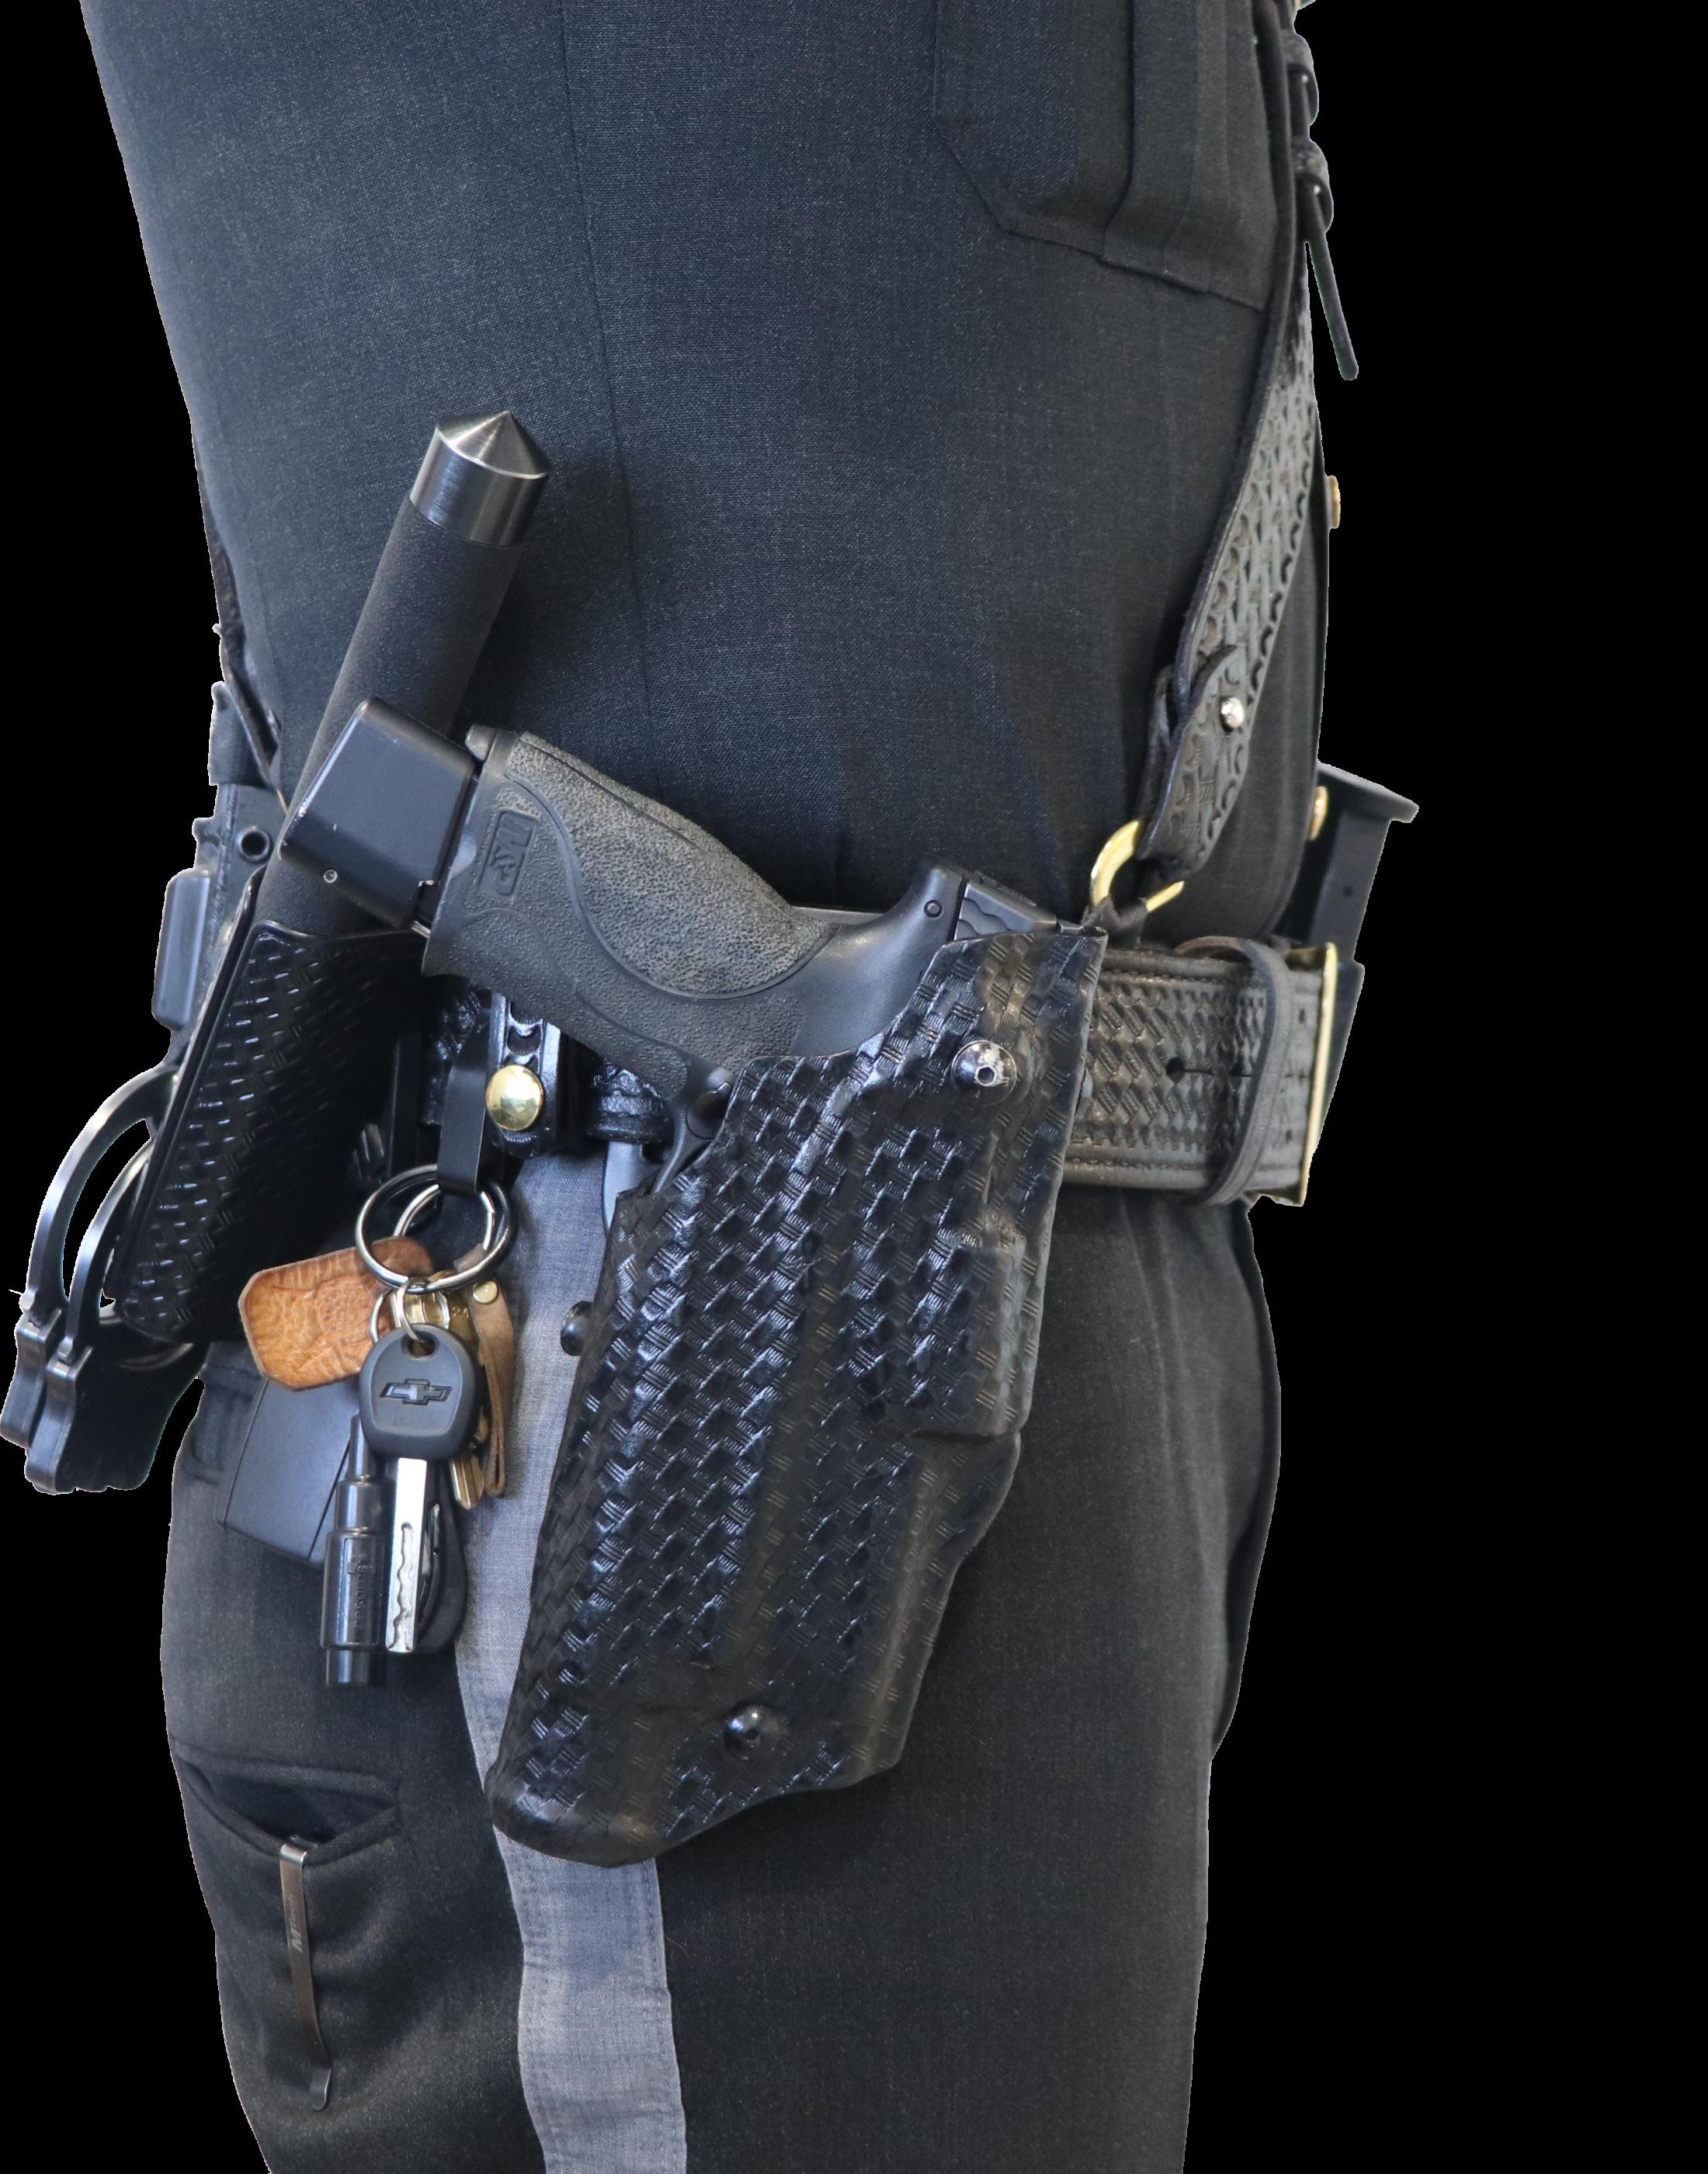 SandBrown Duty Belt 2 (cut)